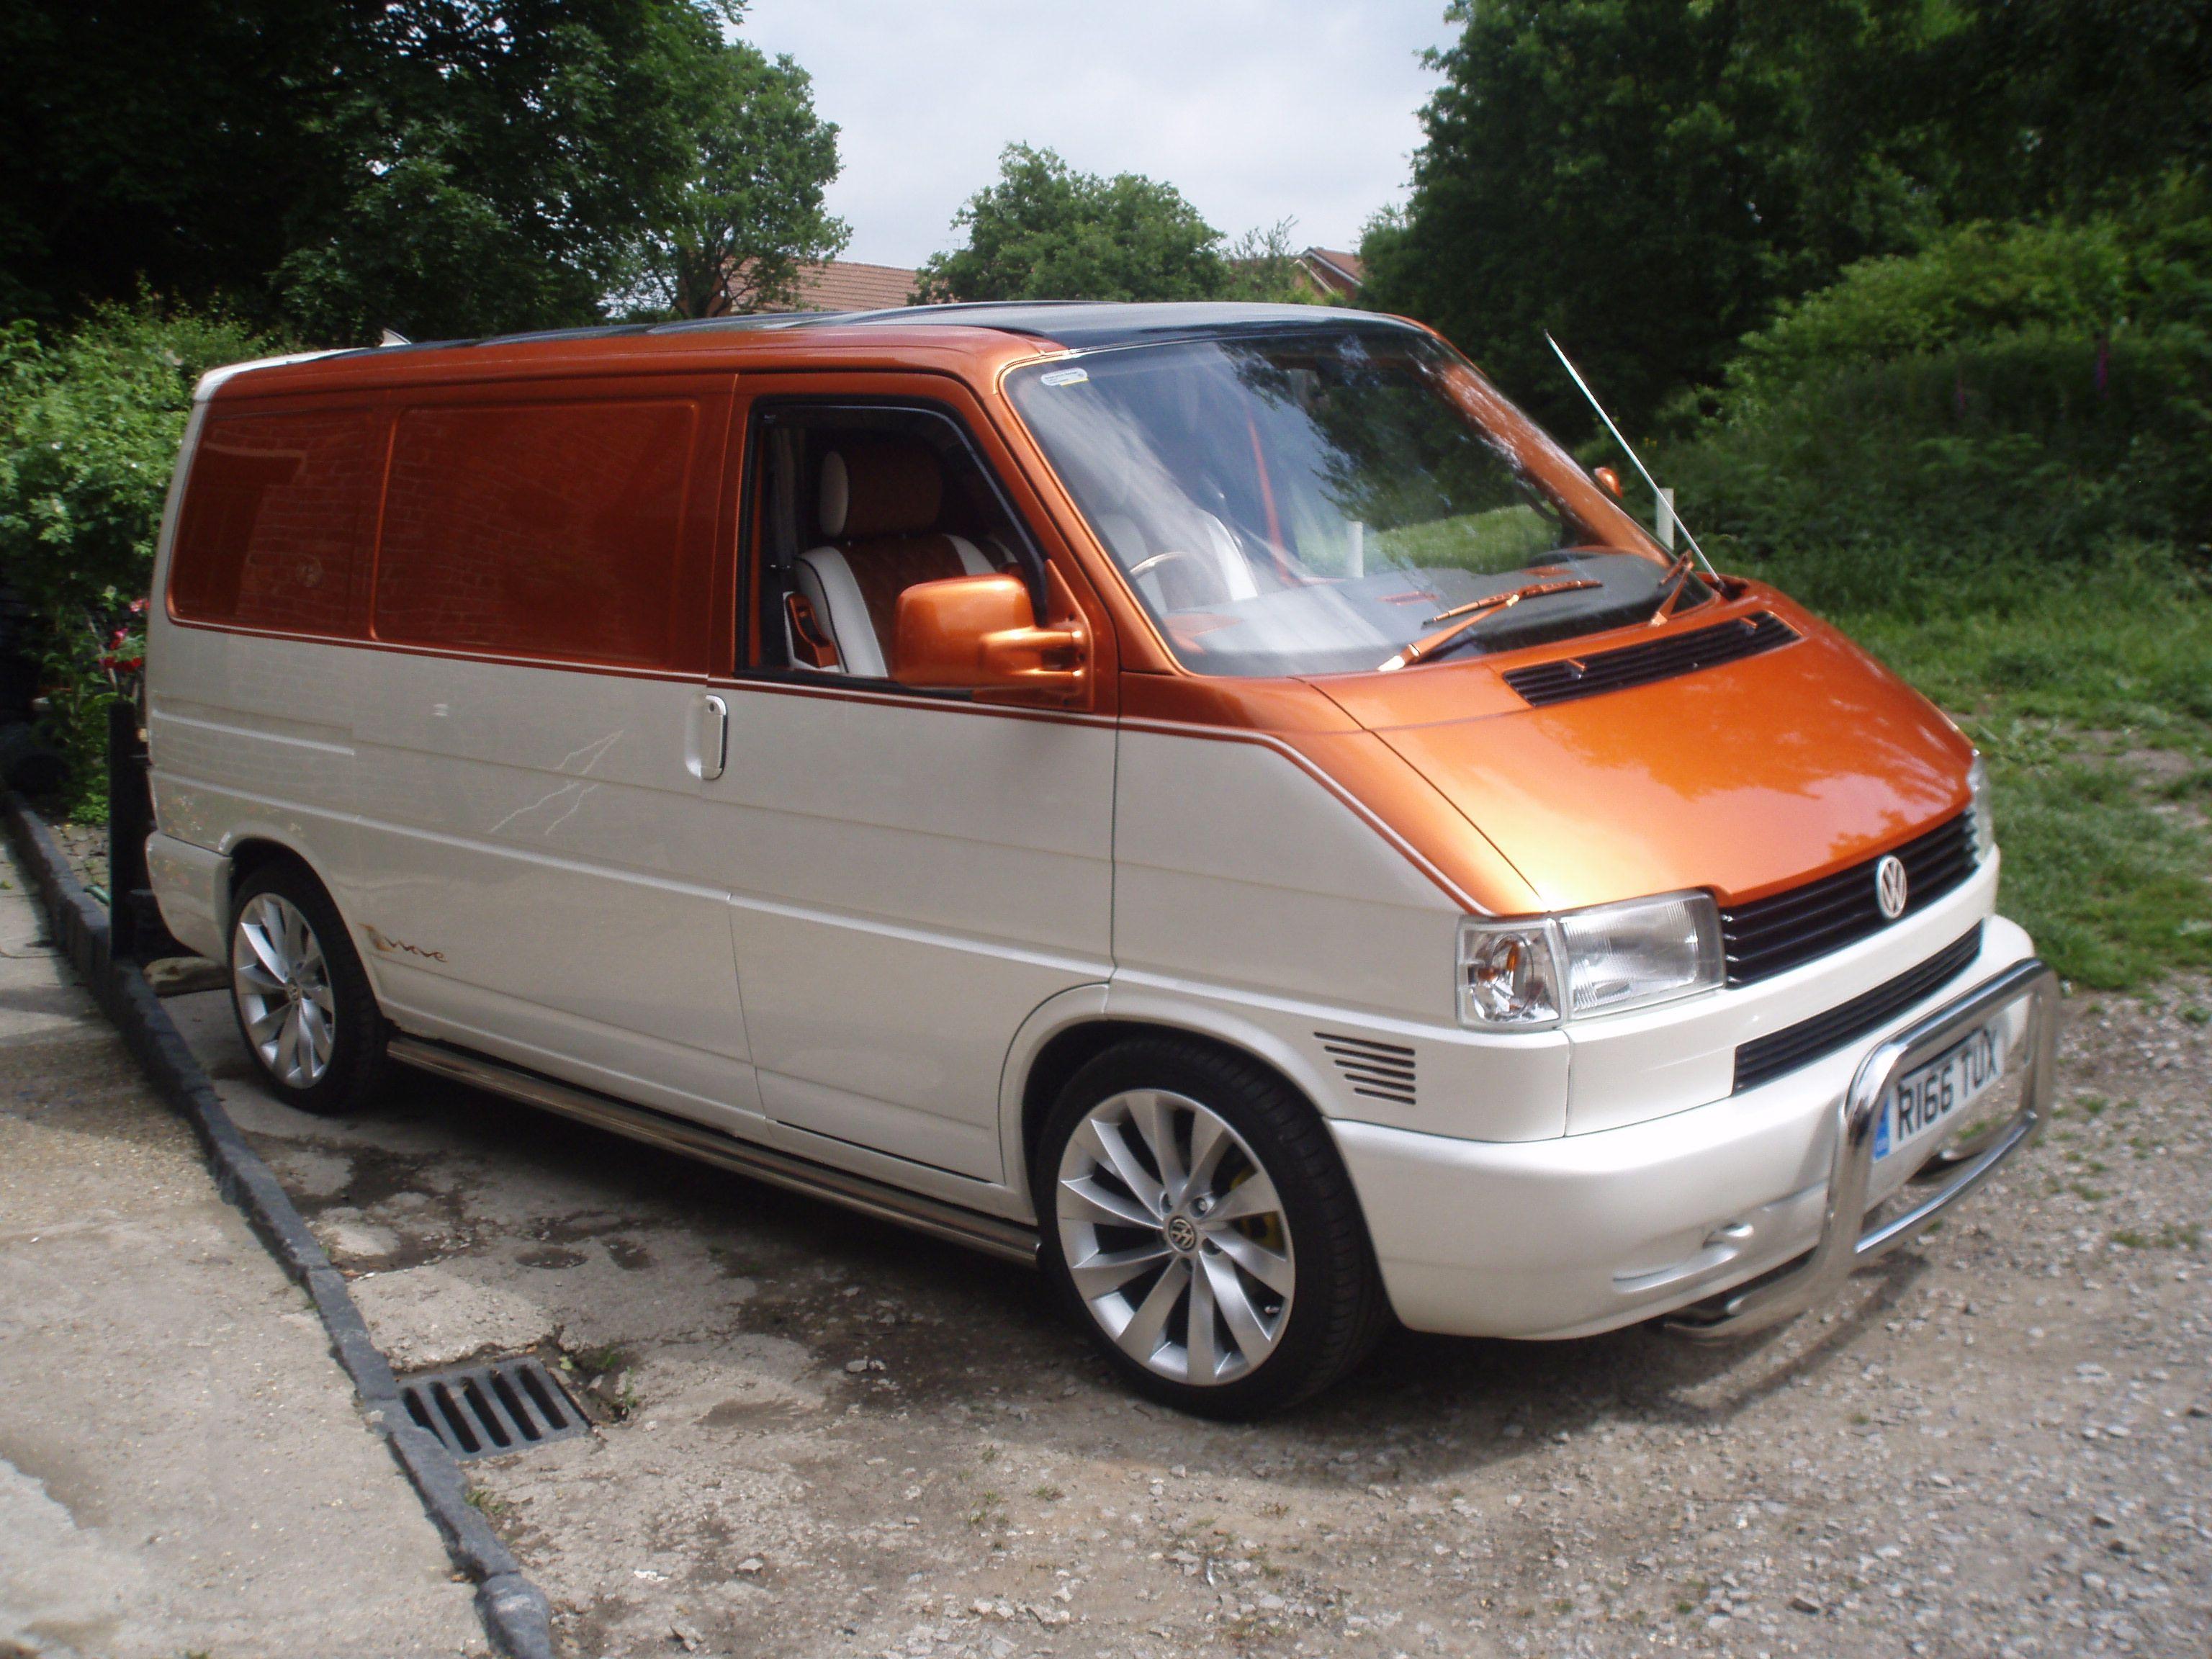 VW T4 Transurfer Van Custom Paint Job House Of Kolor Snow White Pearl Cinnamon Orange Painted By James Pratt J P Autos Stockport